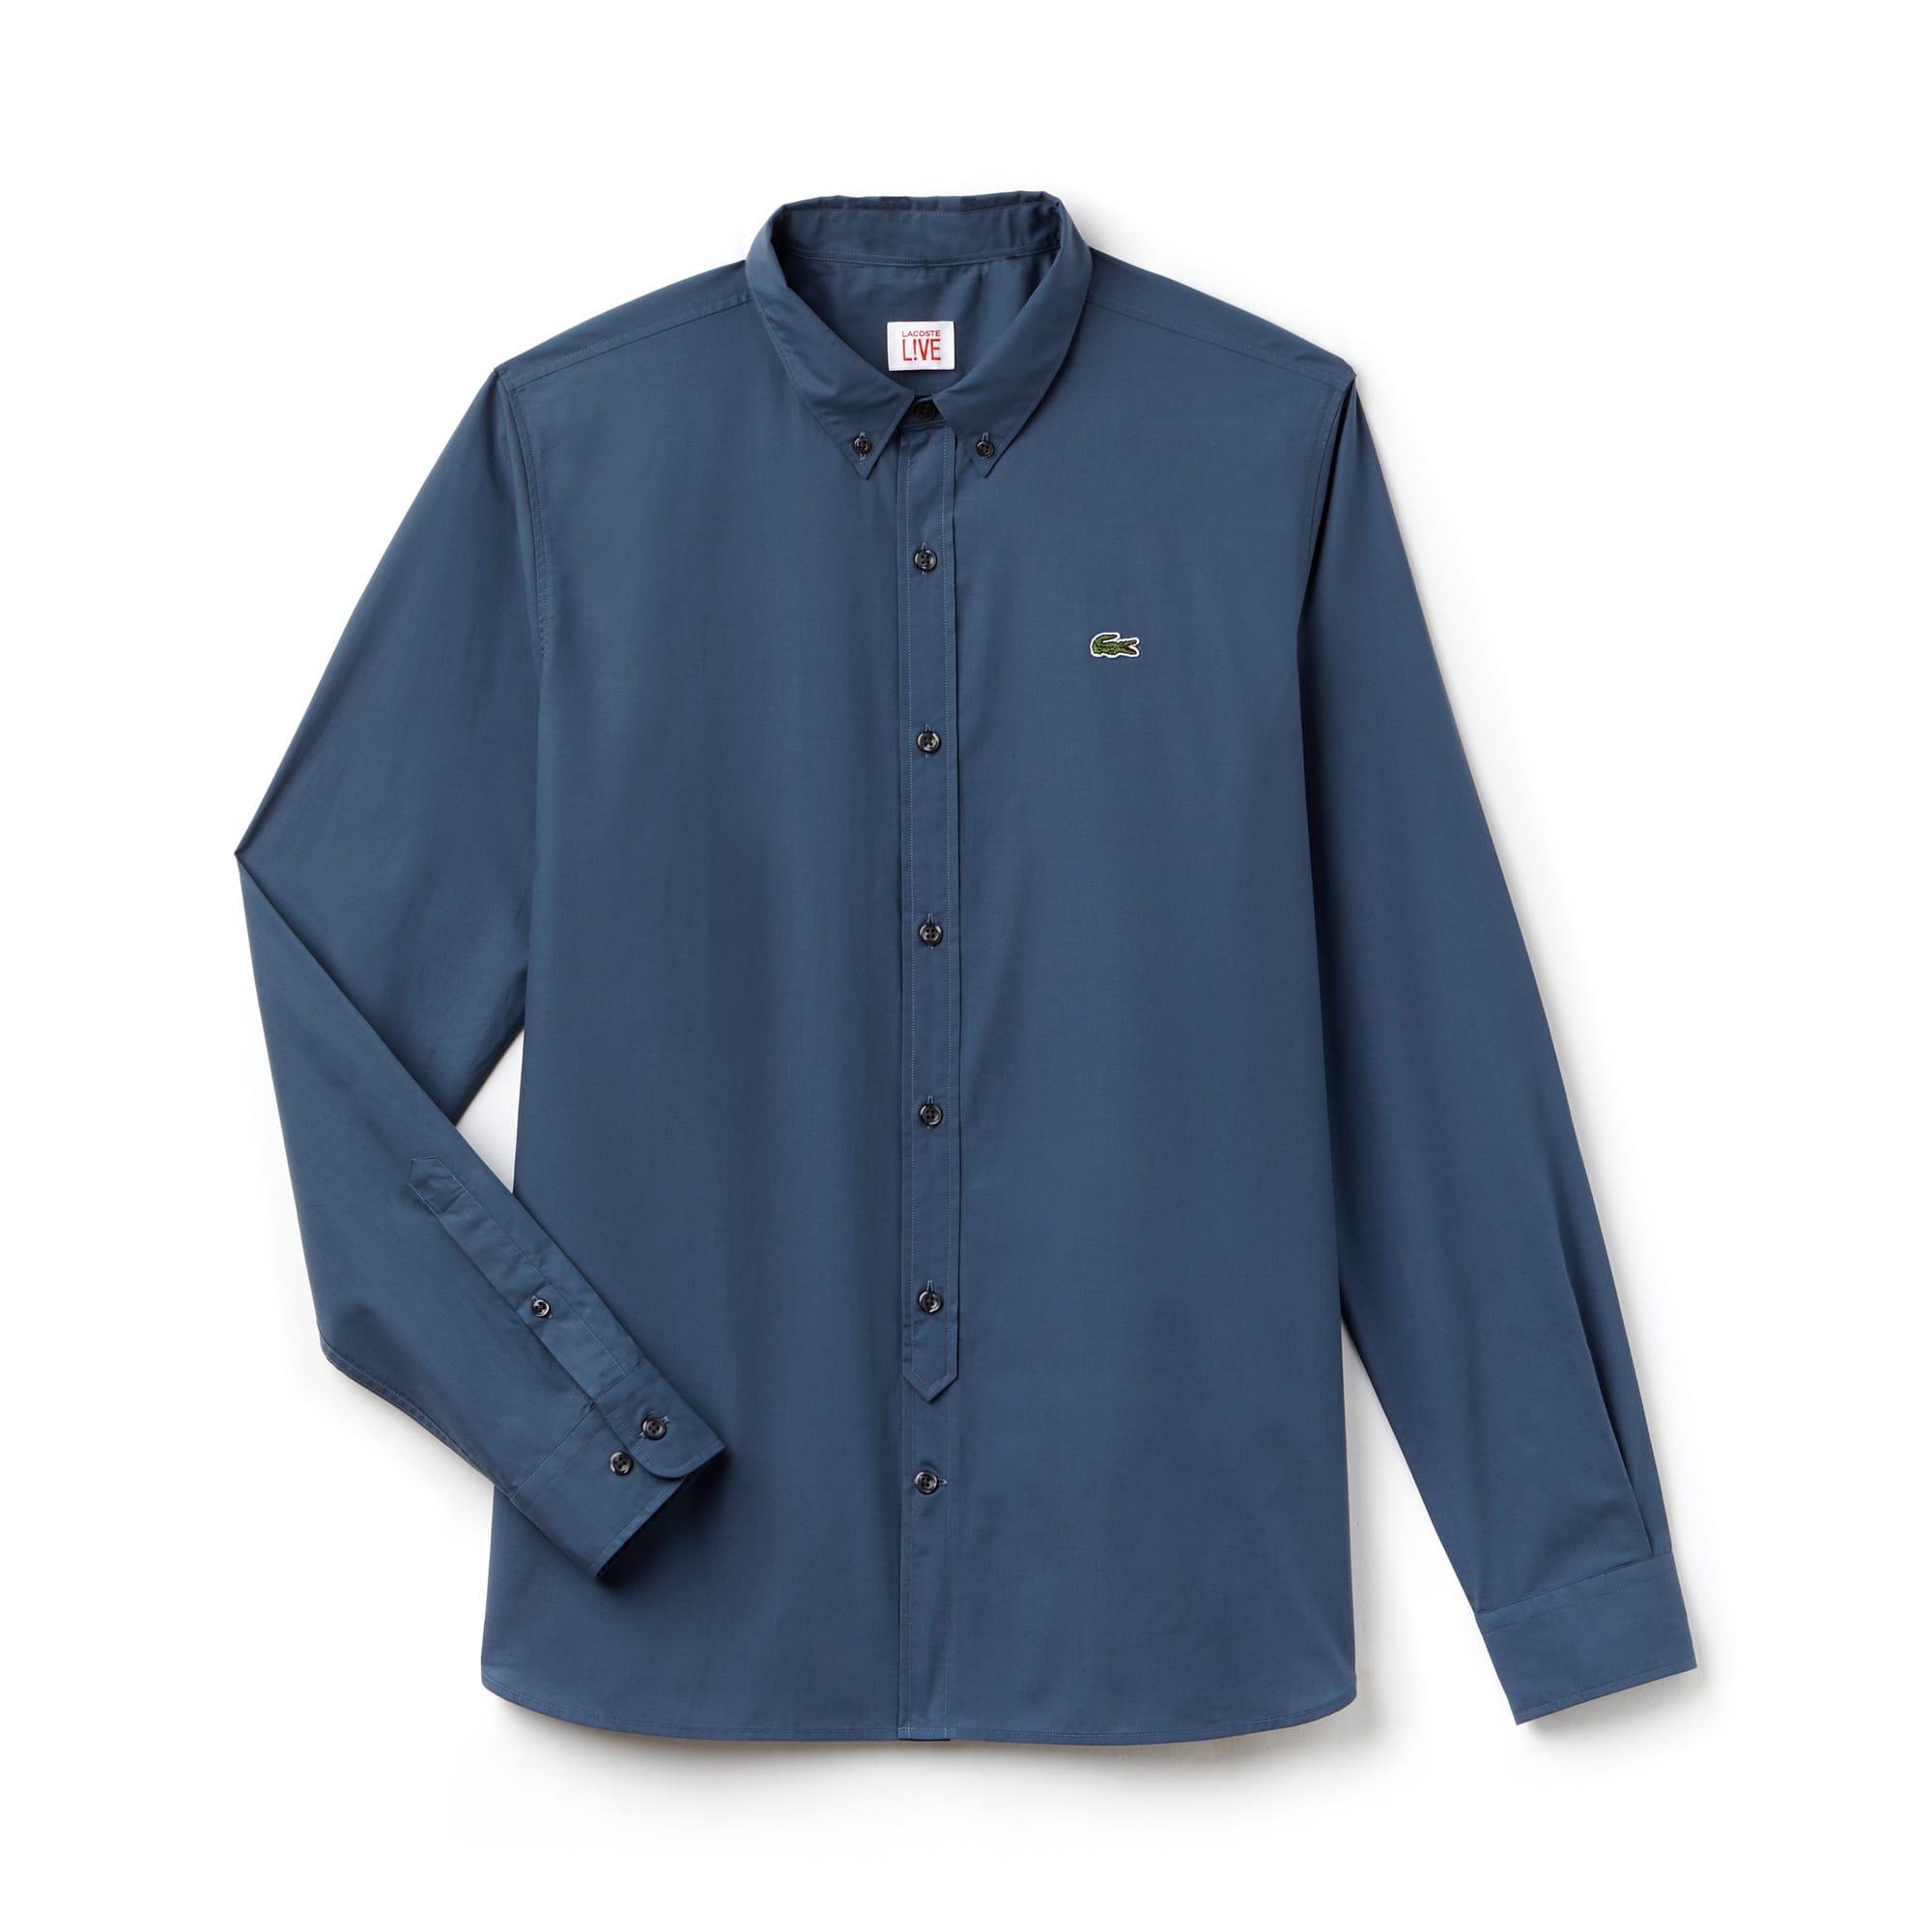 Camisa Lacoste LIVE Skinny Fit Masculina em Popeline de Algodão 11f81bb9d4